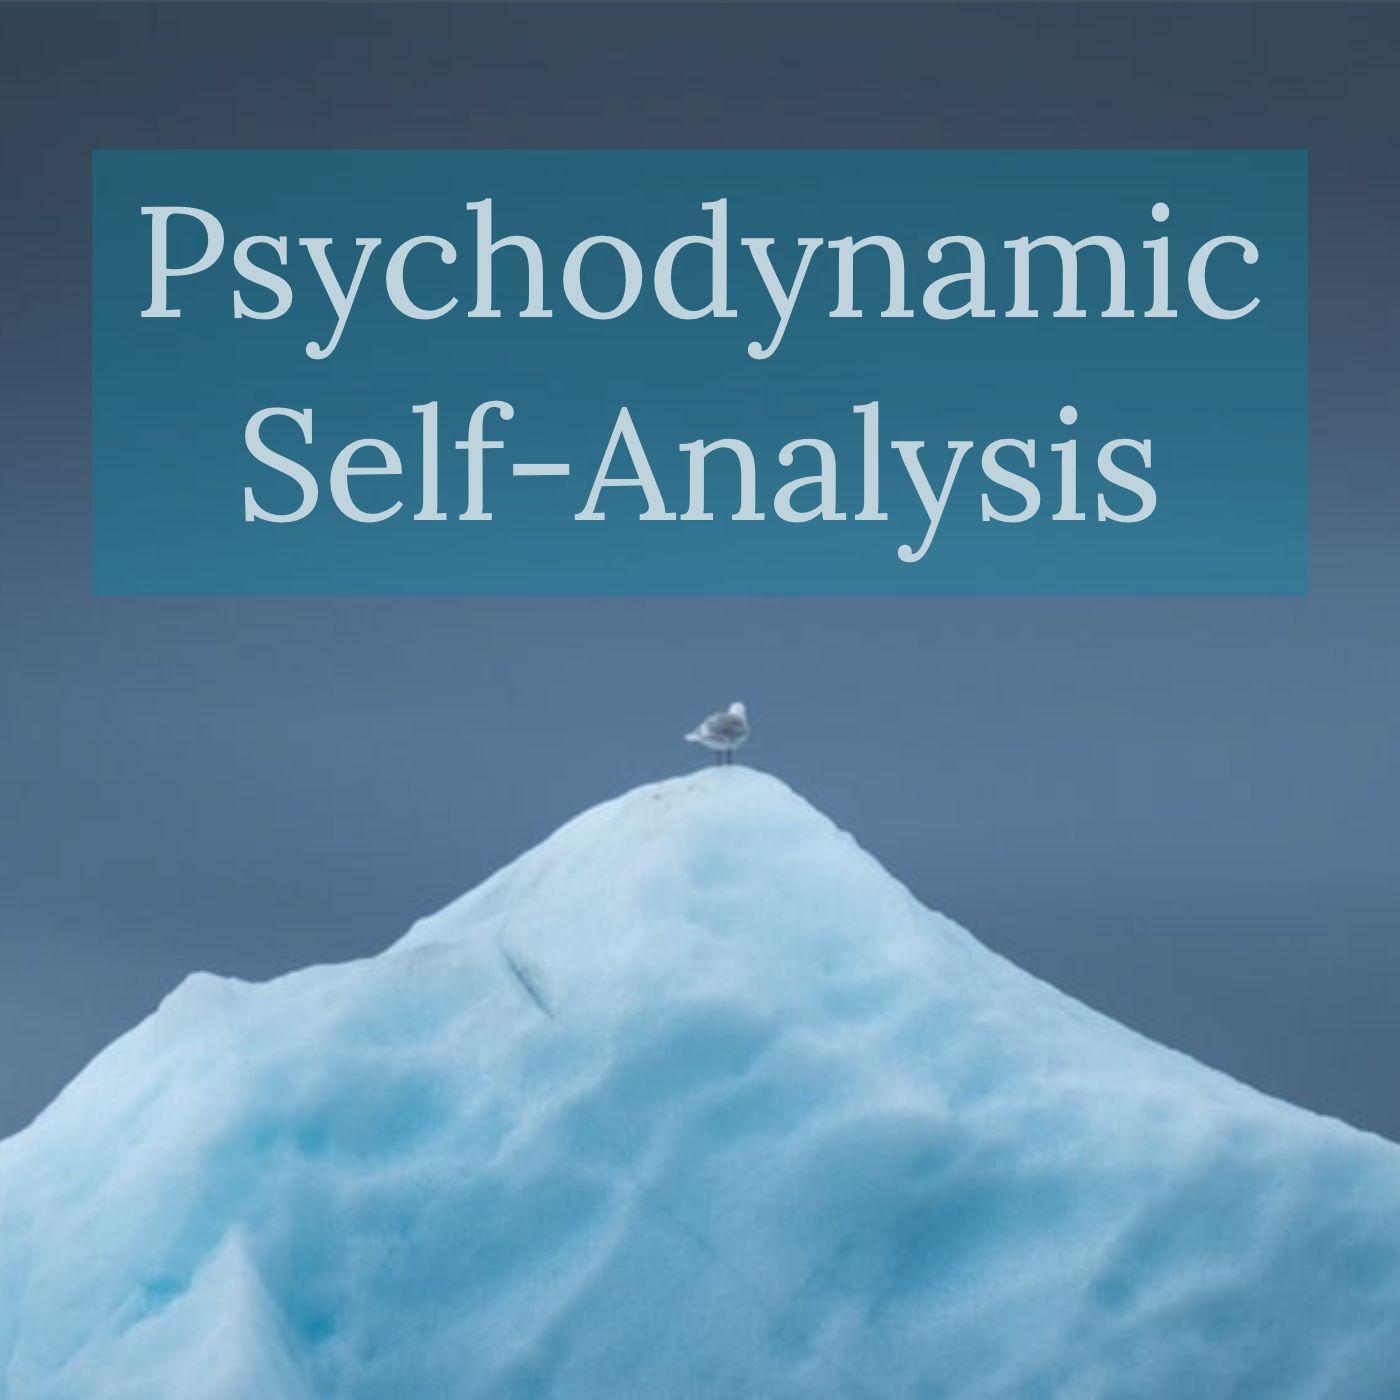 Psychodynamic Self-Analysis (2015 Rerun)